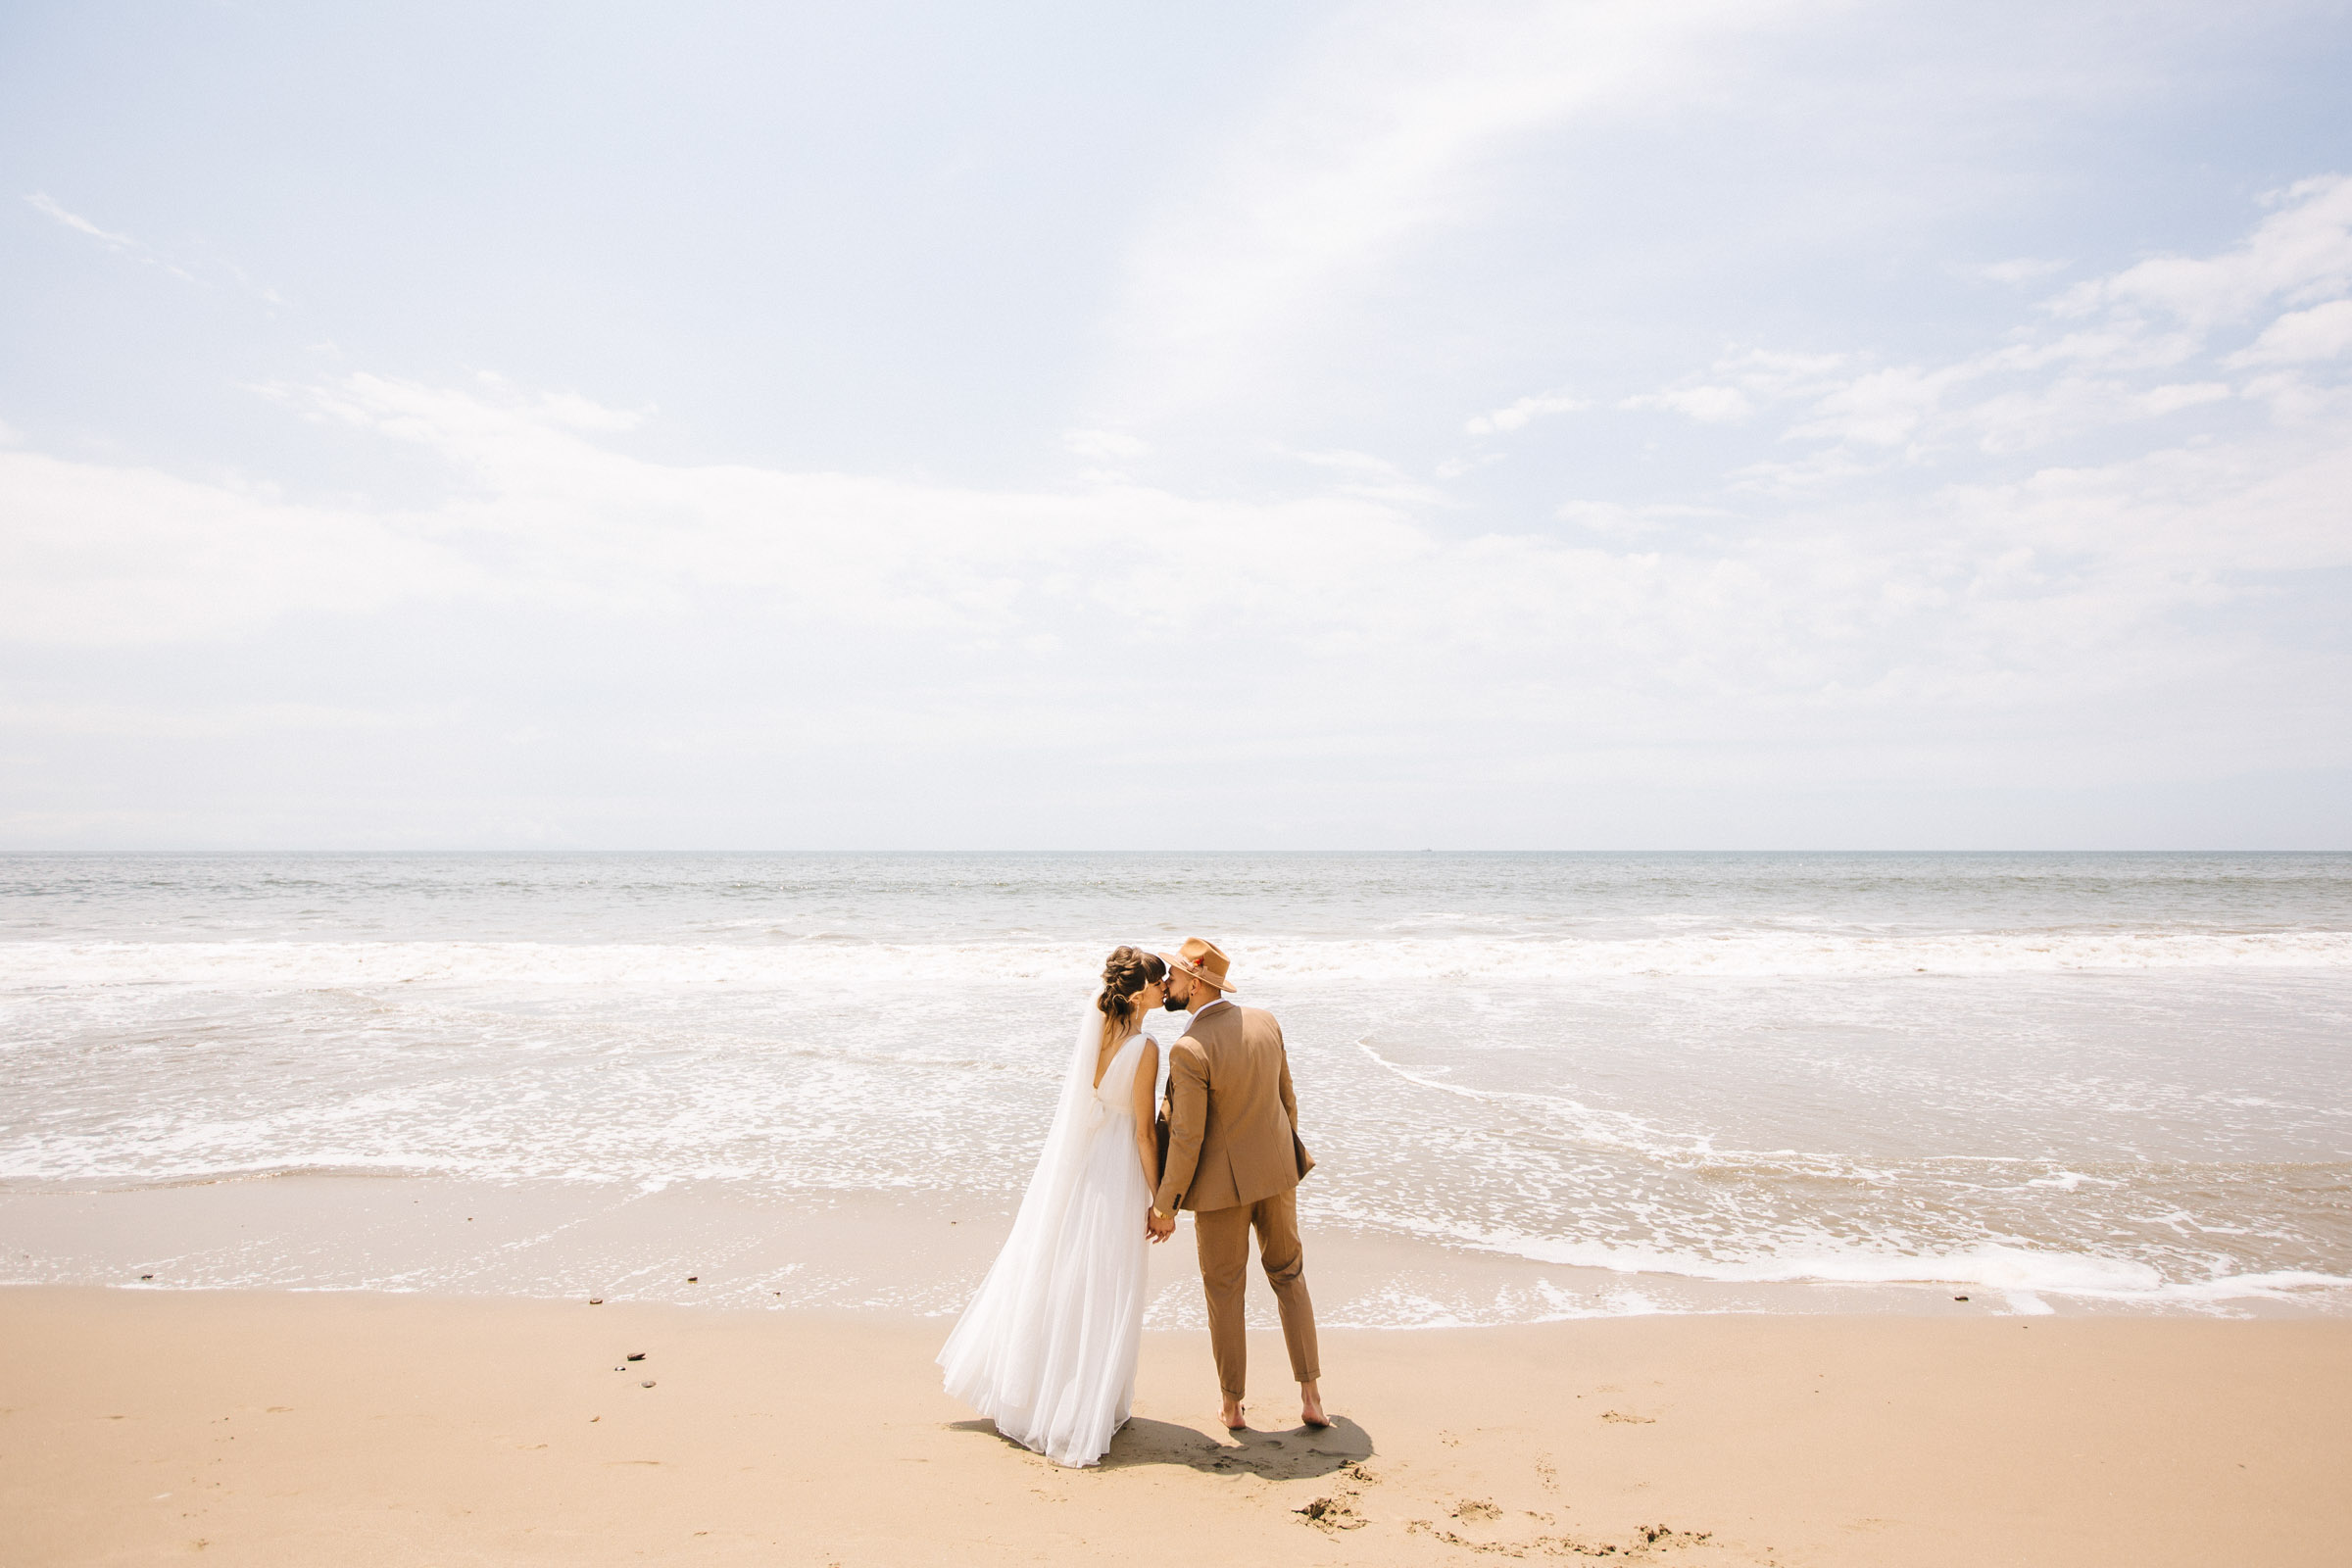 Romantic wedding photo bride and groom b